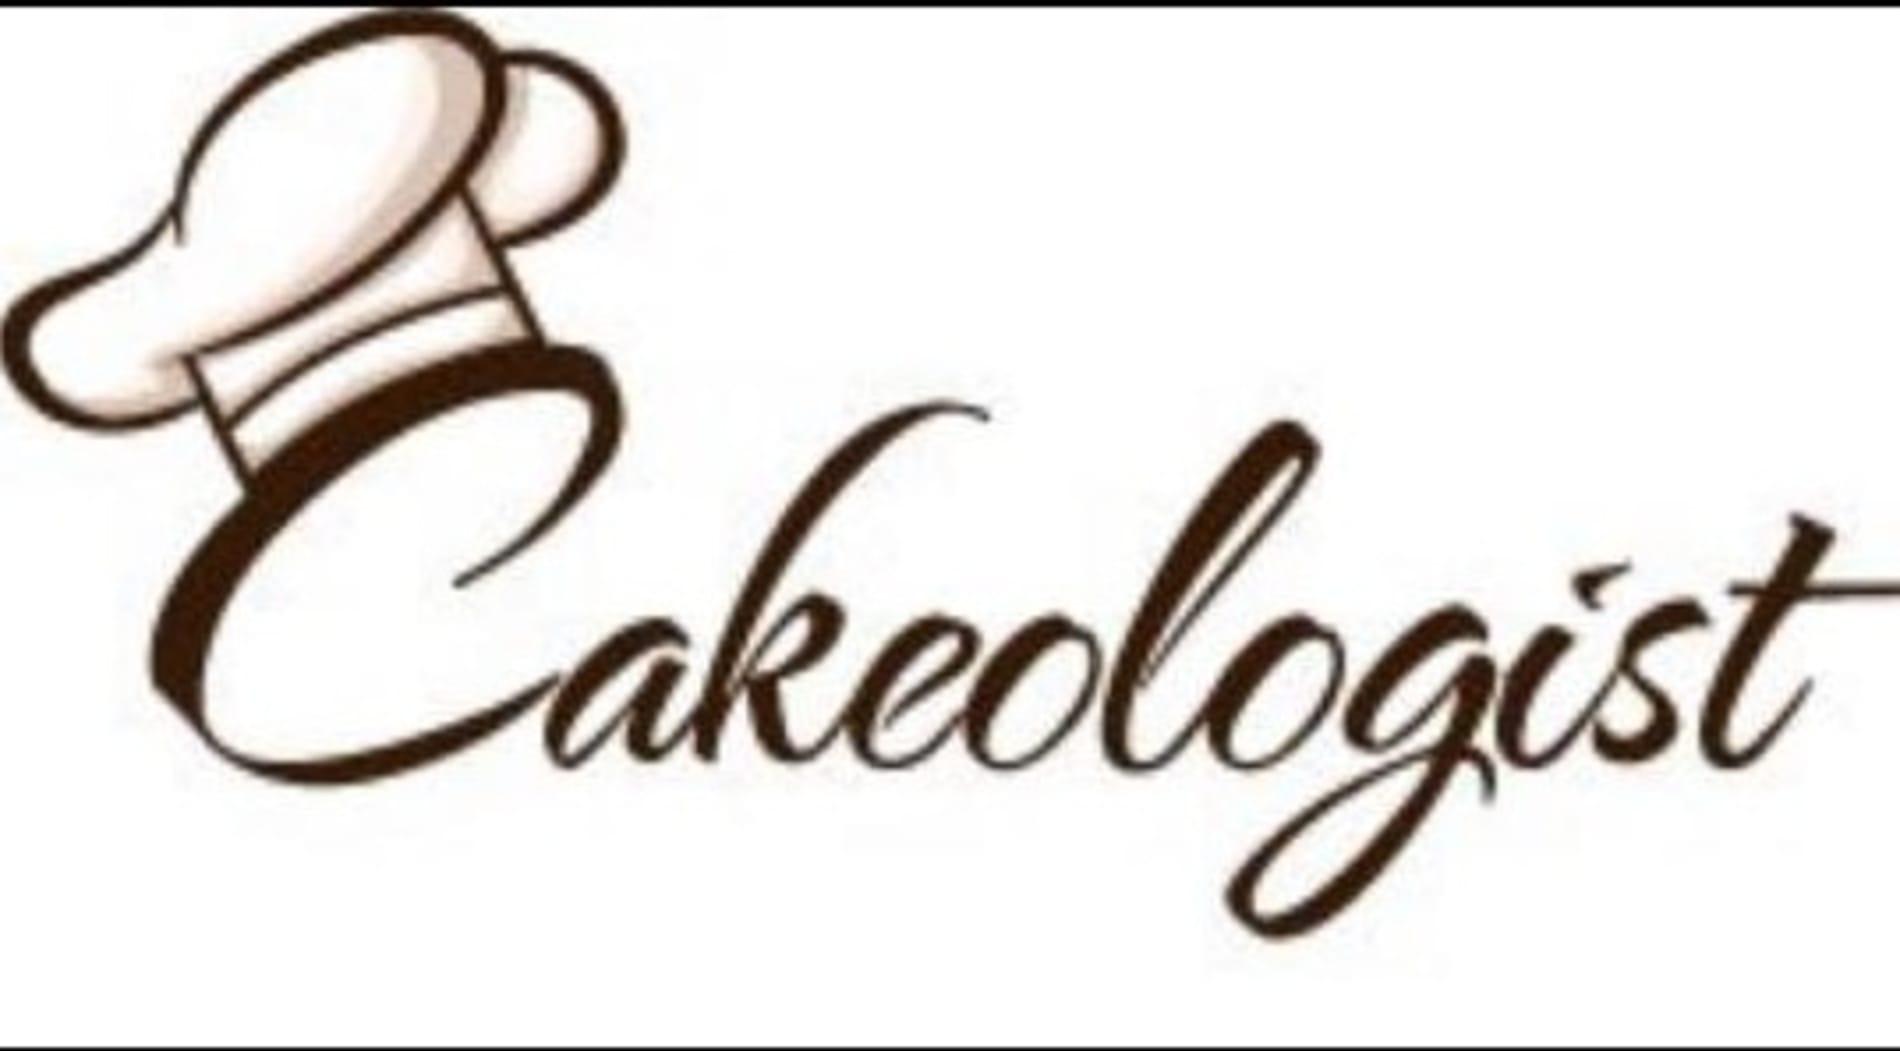 Cakeologist